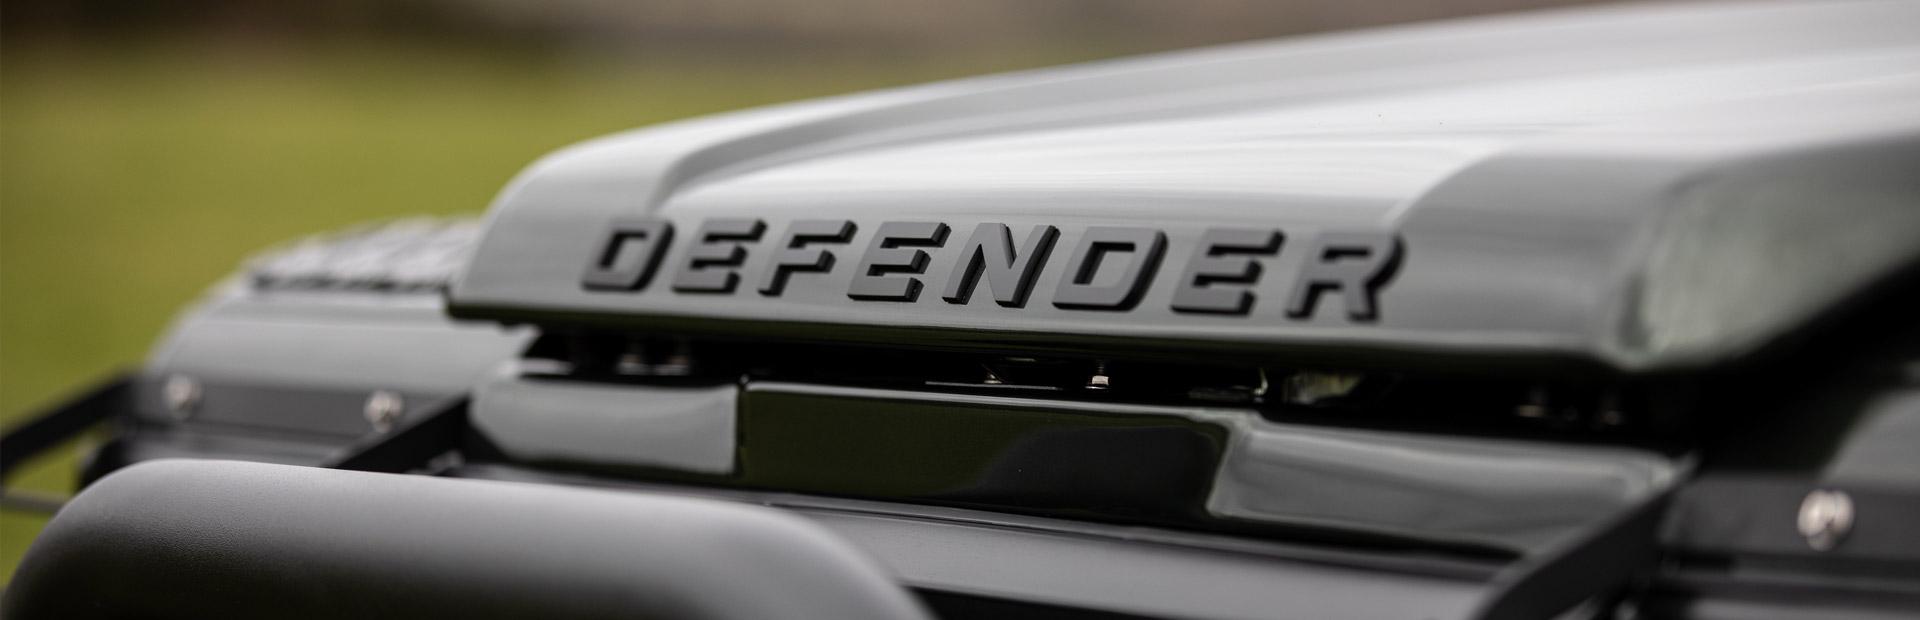 Arkonik The Celt - Custom built Land Rover Defender 110